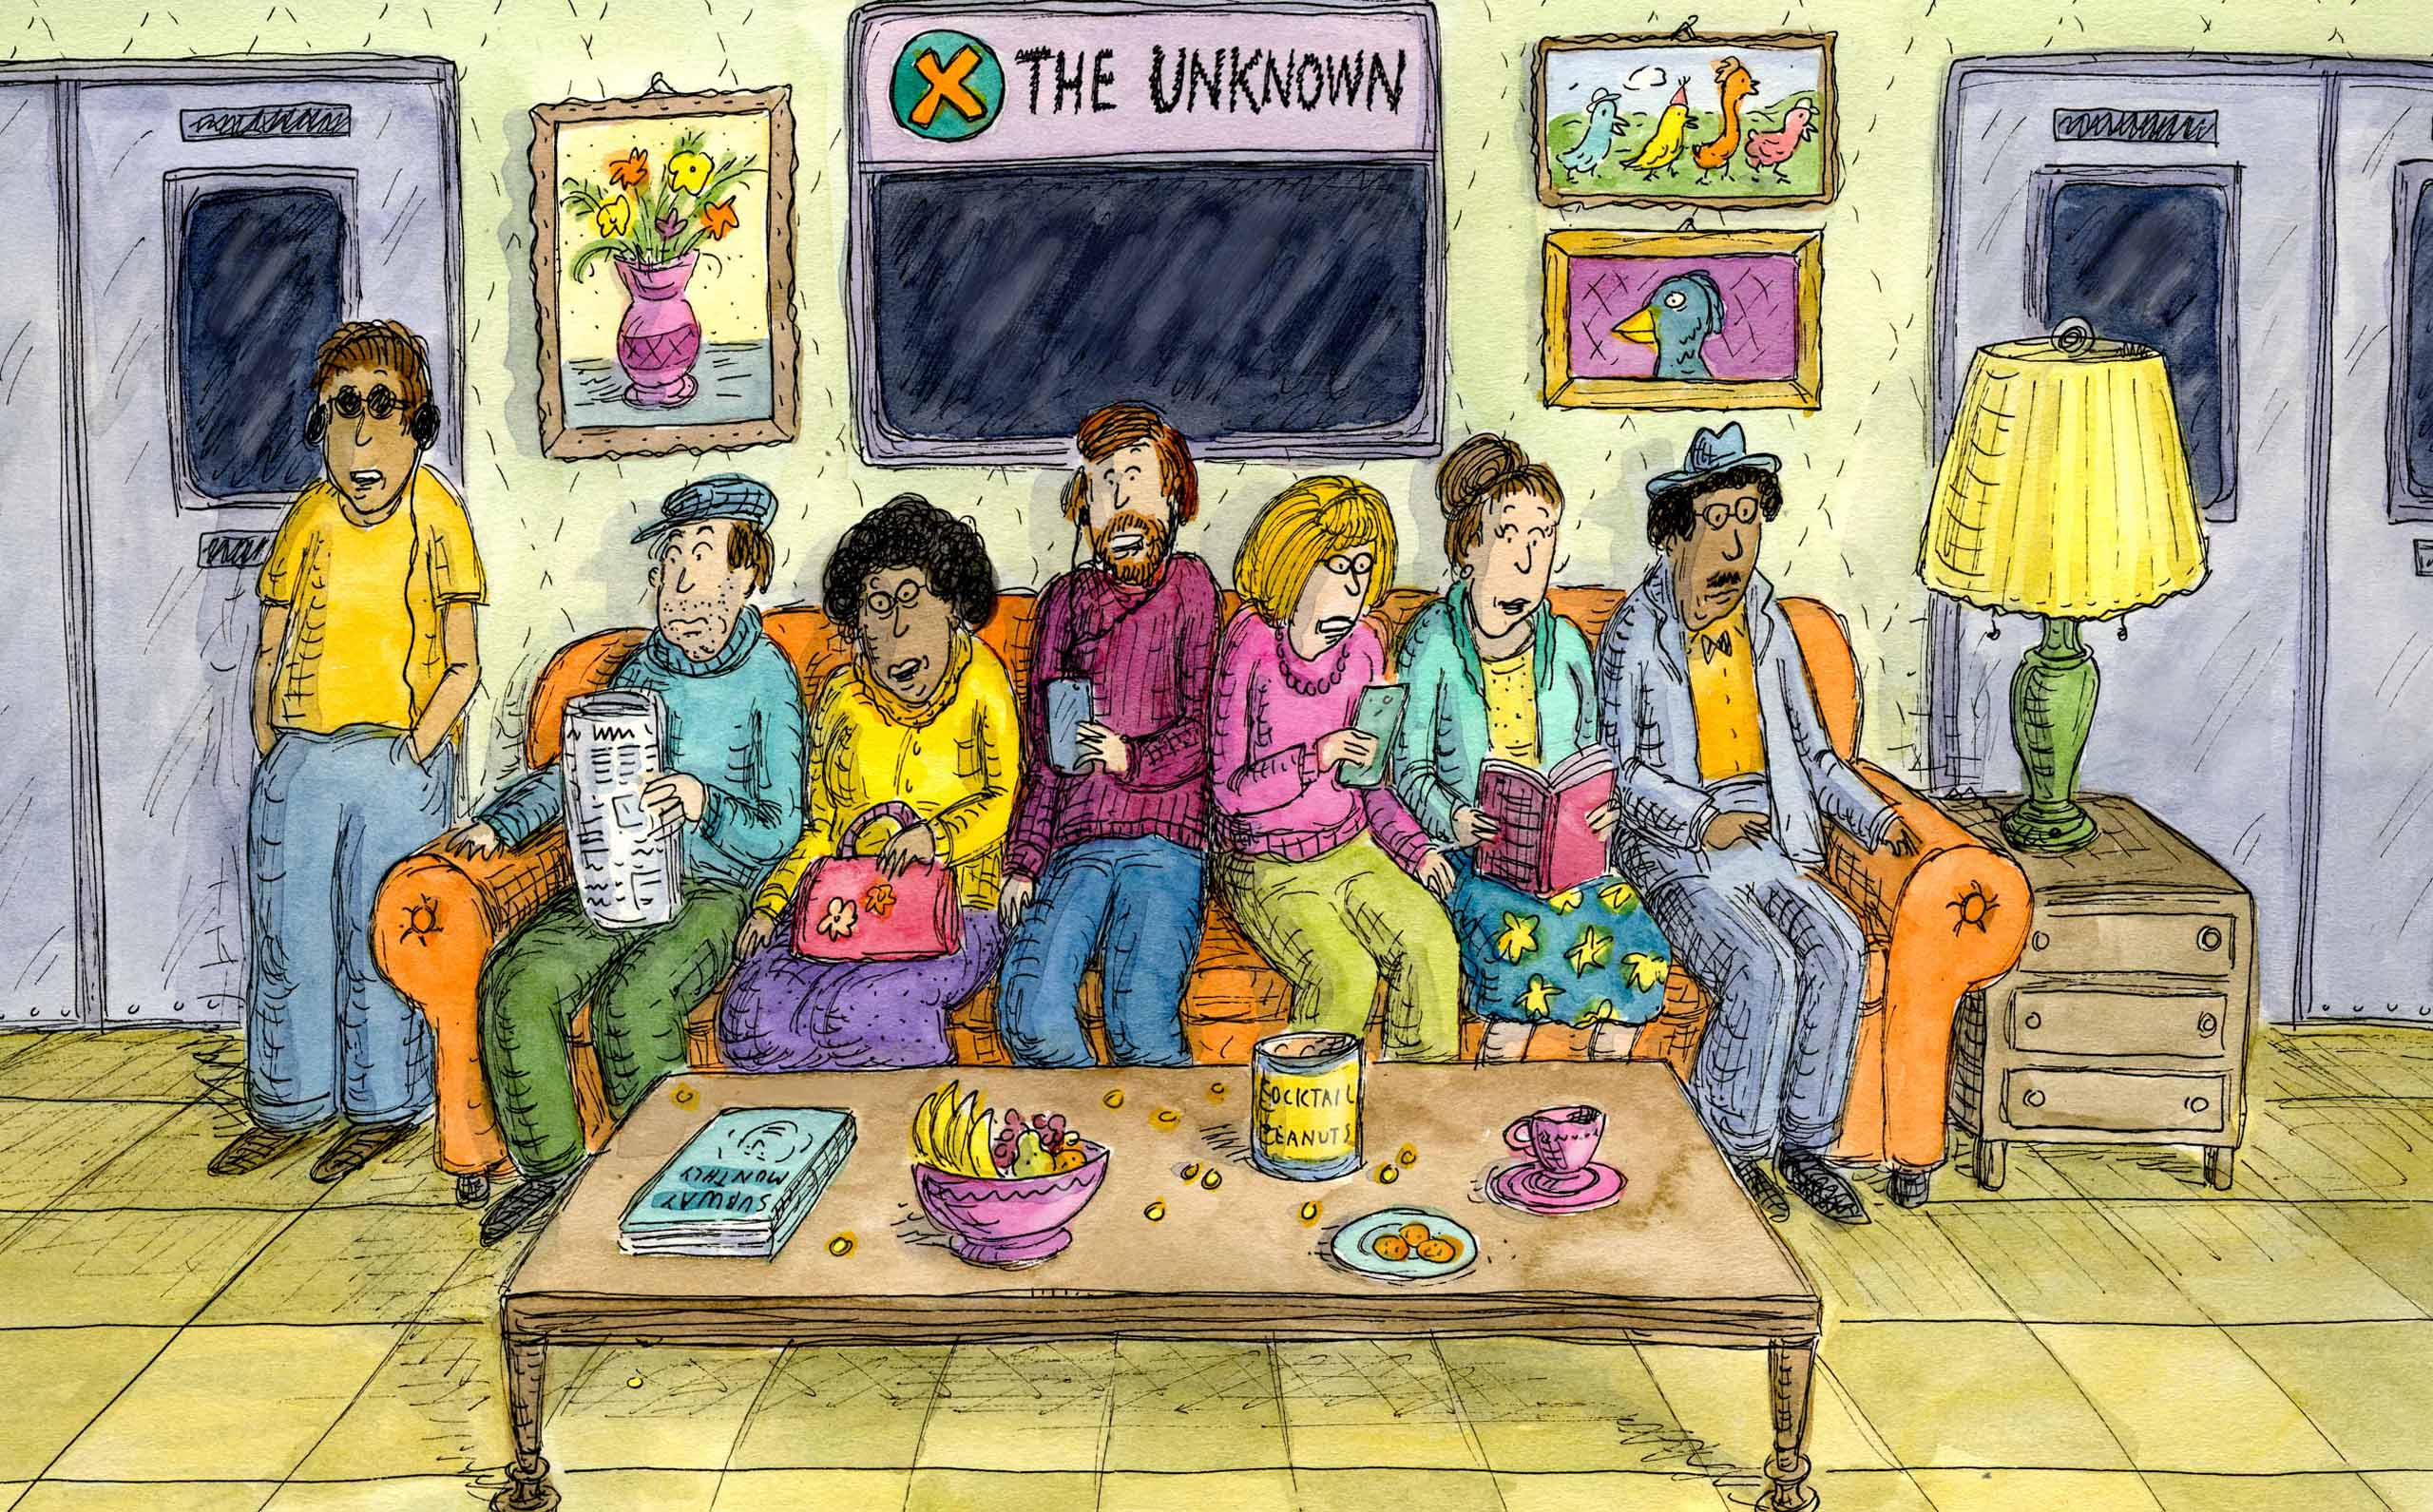 Roz Chastによる地下鉄のソファの漫画